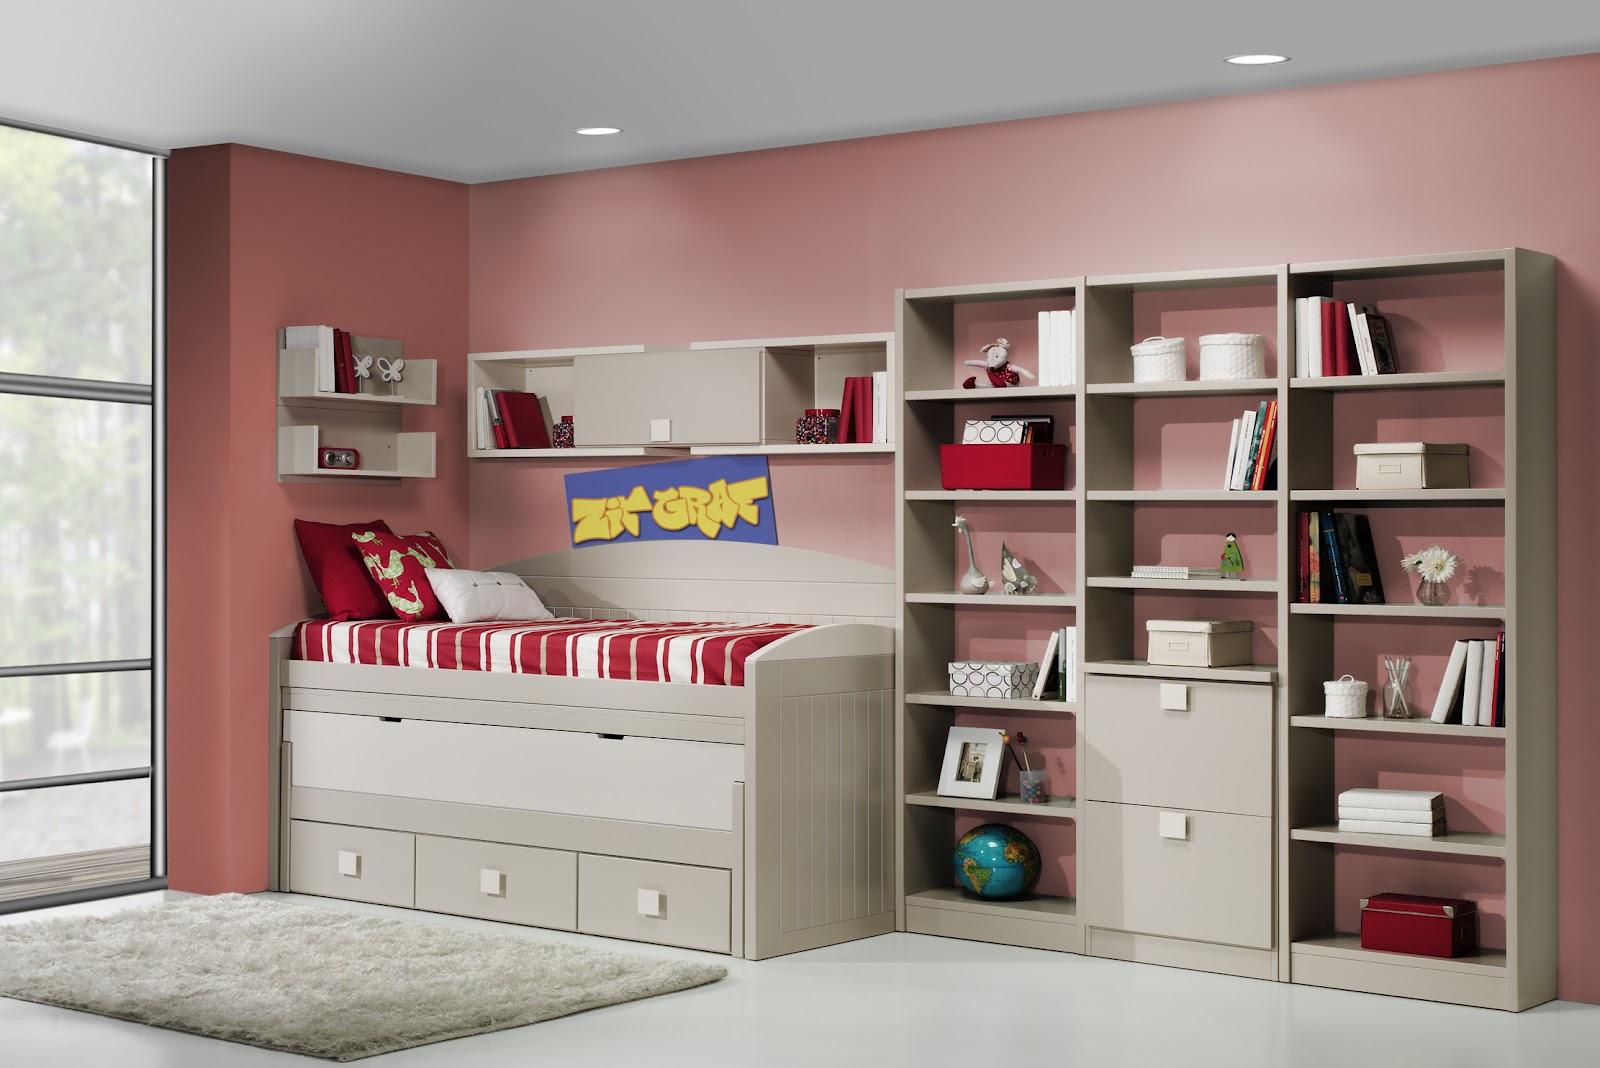 Dormitorios habitaciones juveniles e infantiles lacadas for Dormitorios juveniles de nina